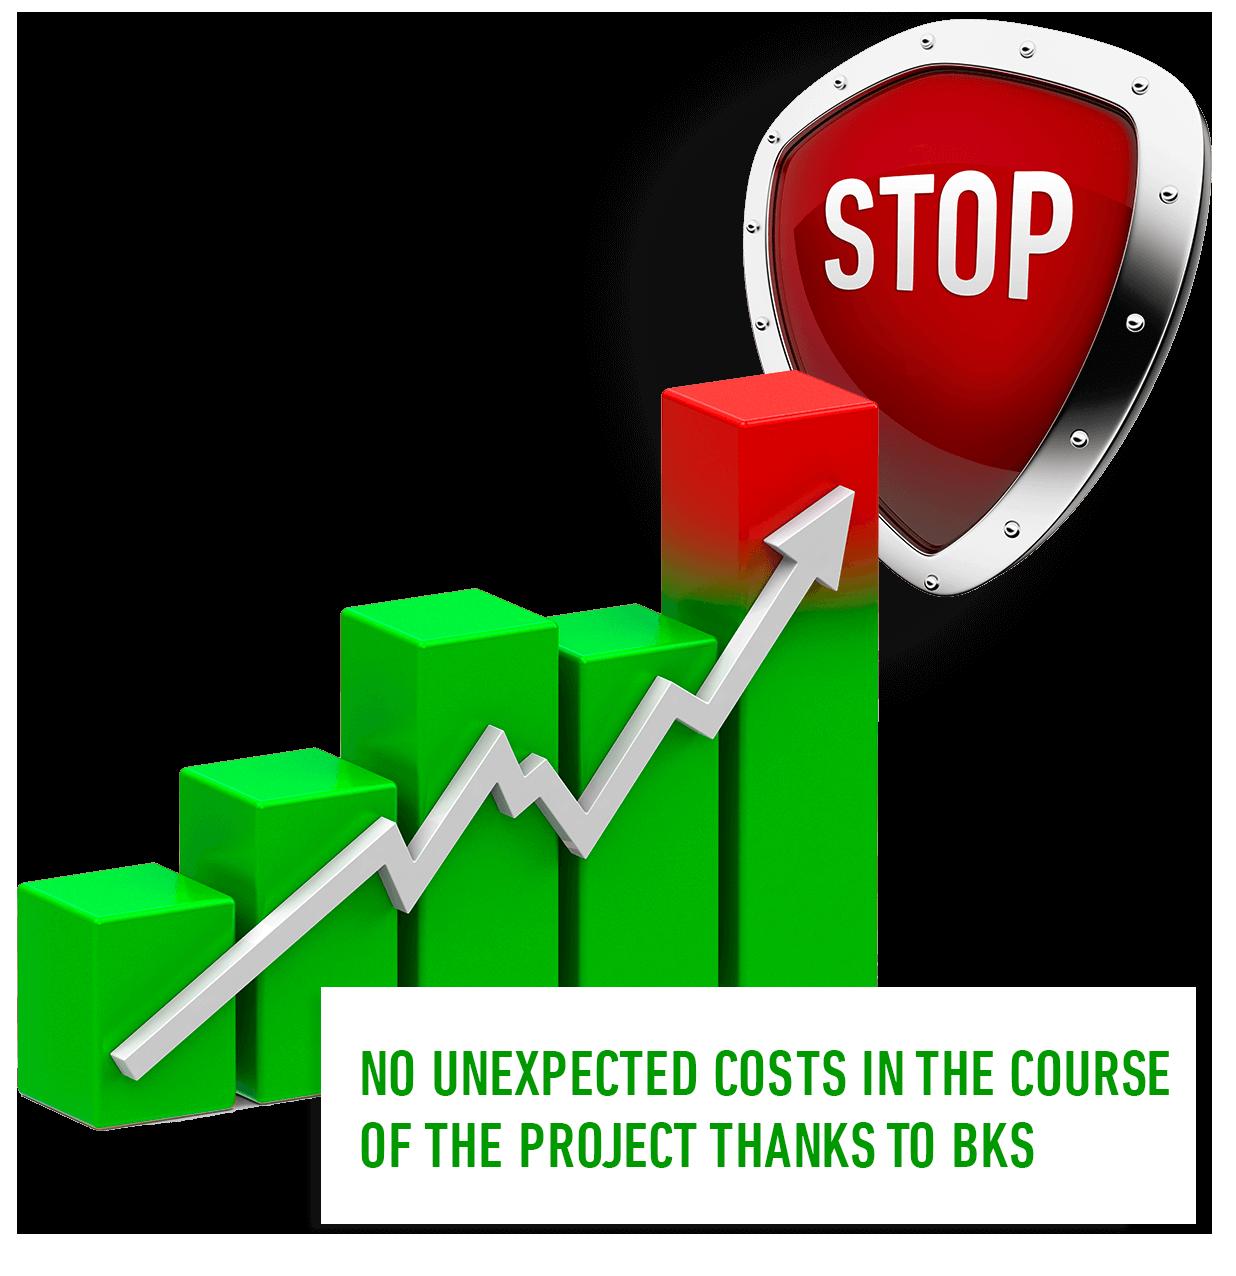 BKS Costs